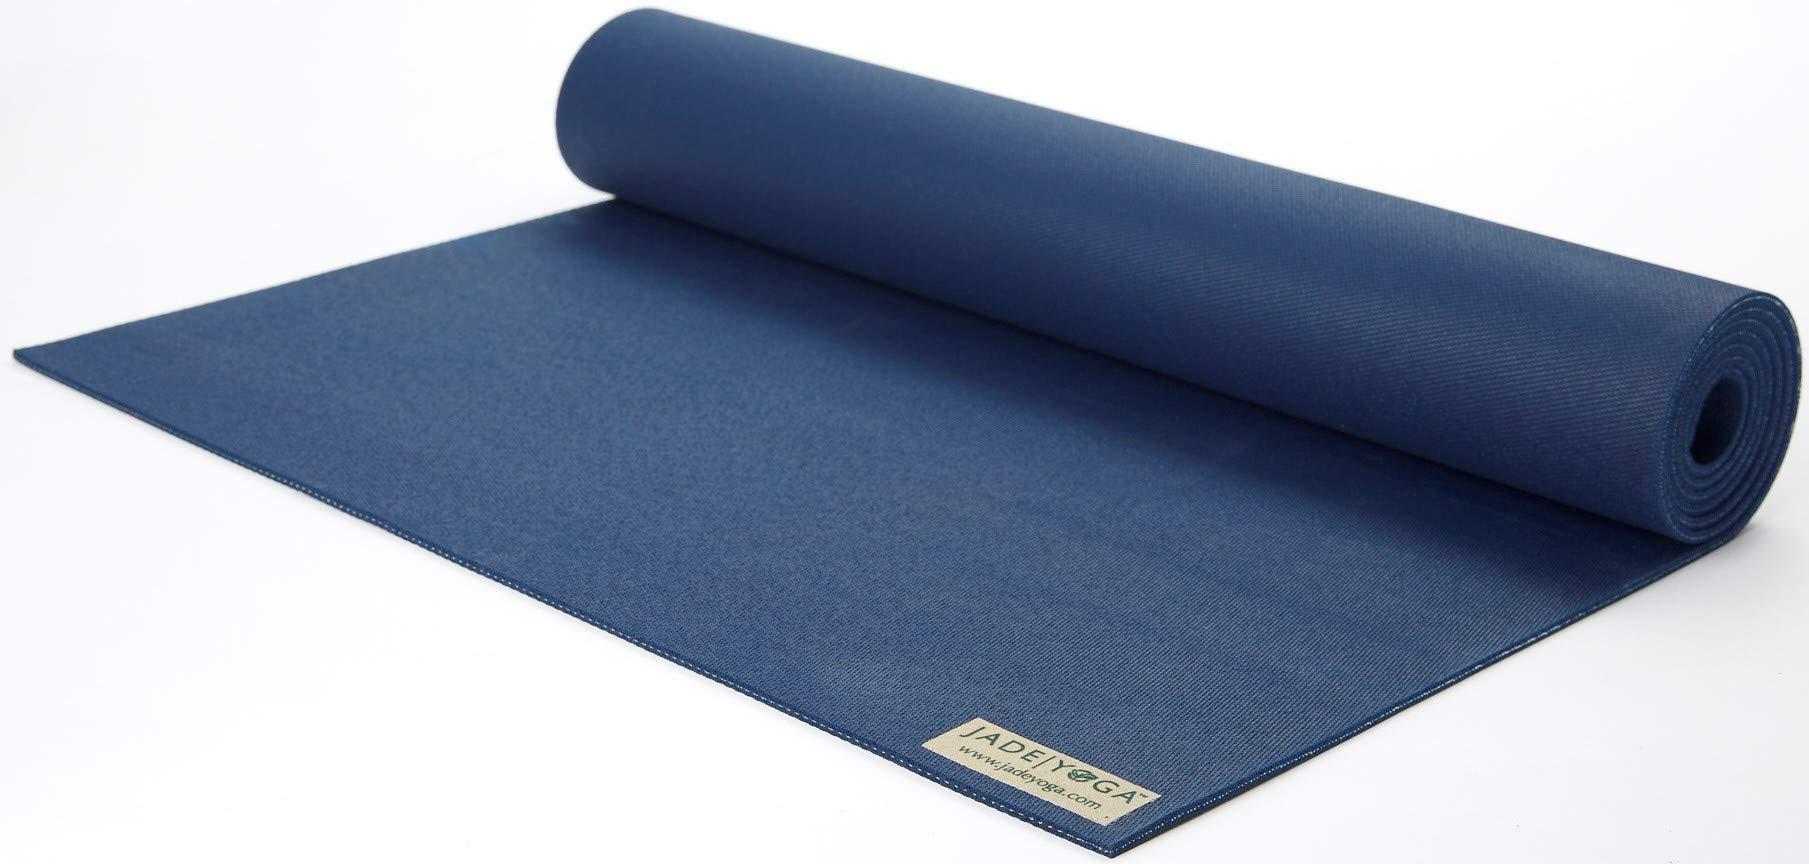 Jade 74-Inch by 1/8-Inch Travel Yoga Mat (Midnight Blue)